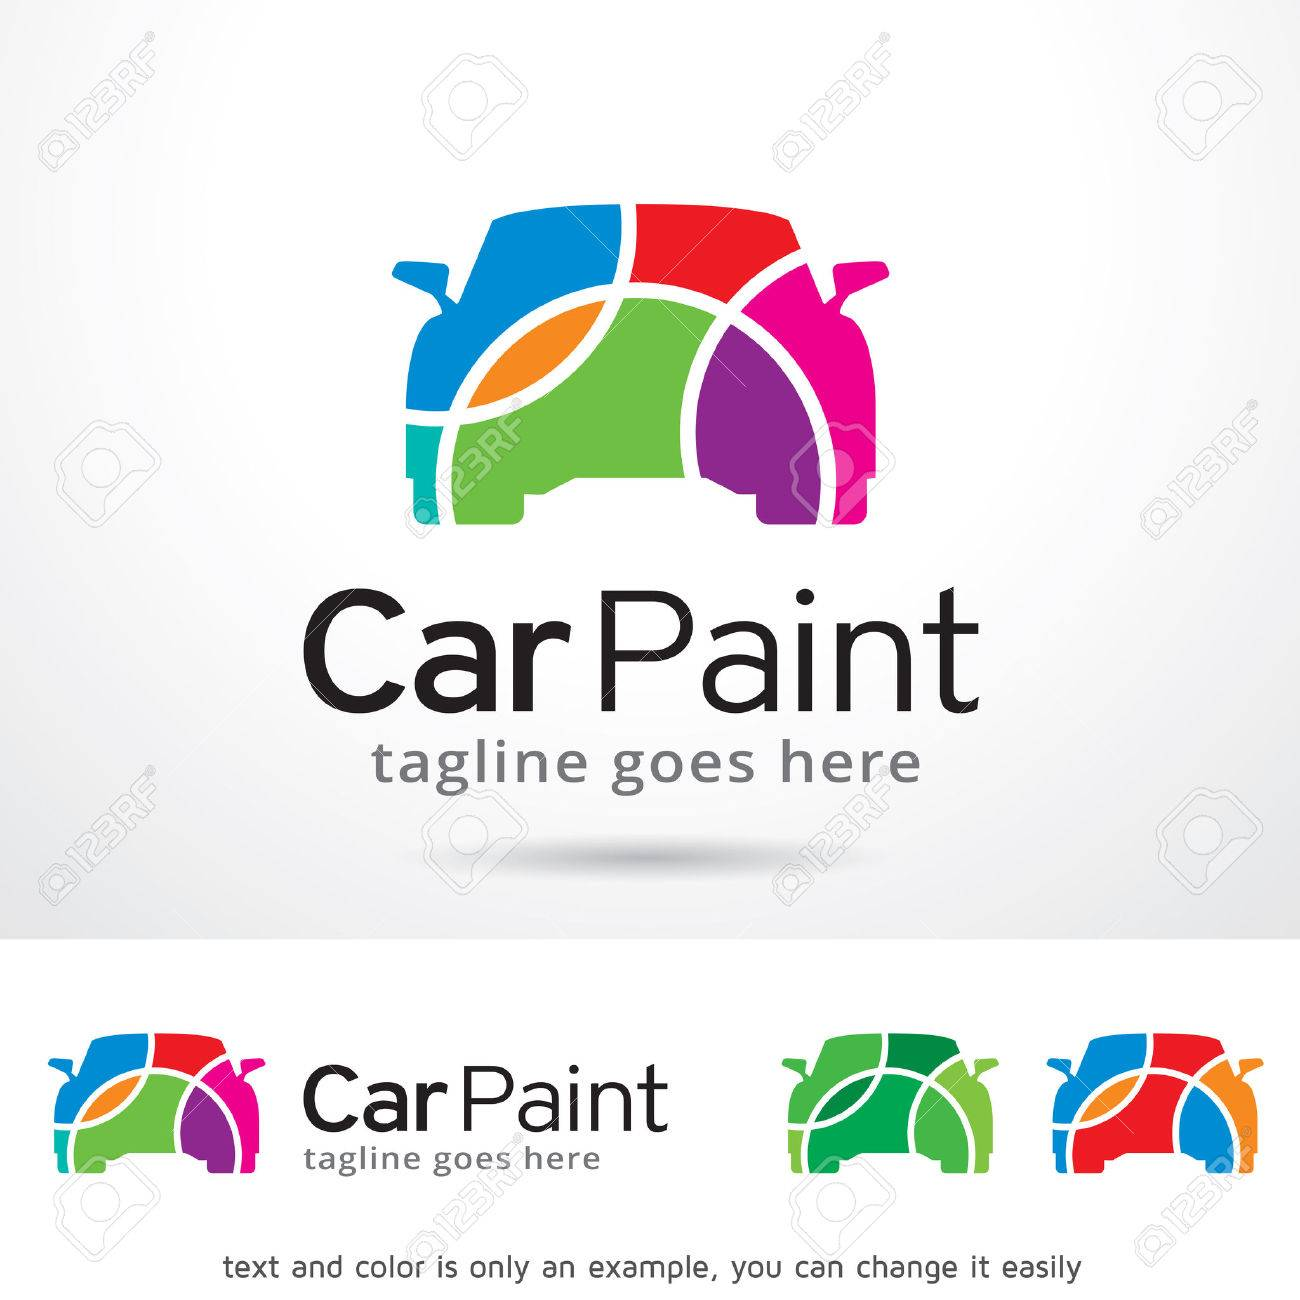 design templates vectors splash vector social worker resume sample 60731108 car paint template design vector stock - Wwwresume Formatcom